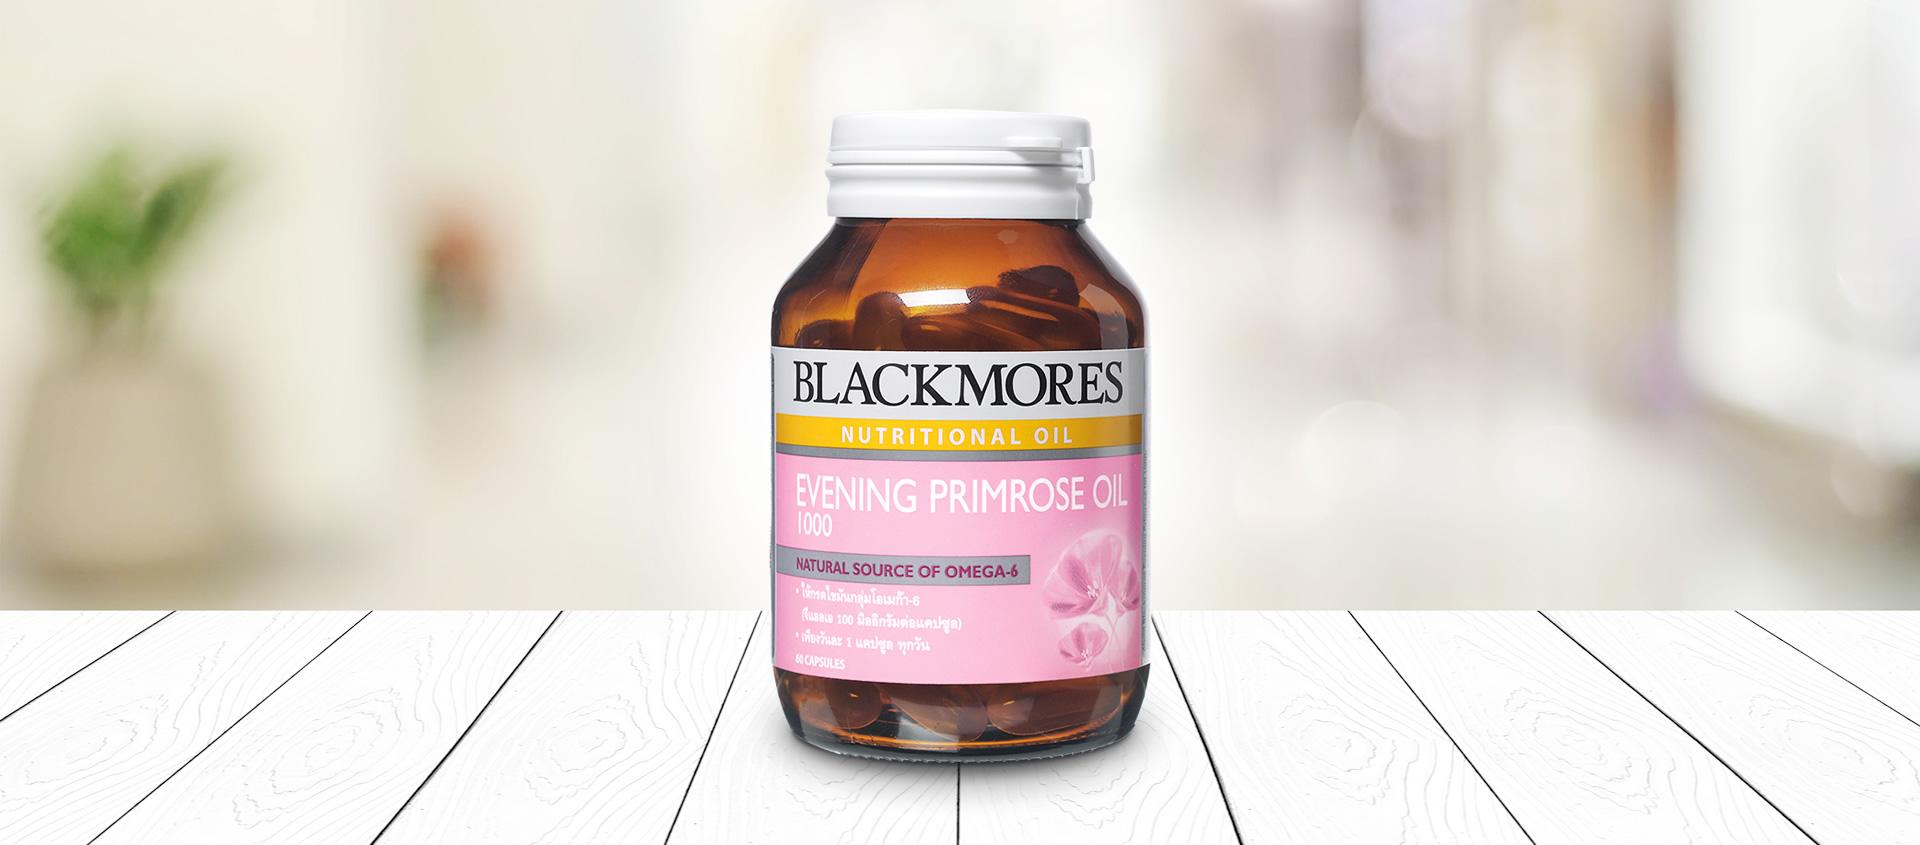 Blackmores Evening Primrose Oil 1000 แบลคมอร์ส อีฟนิ่งพริมโรส ออยล์ 1000 (น้ำมันอีฟนิ่งพริมโรส ชนิดแคปซูล)